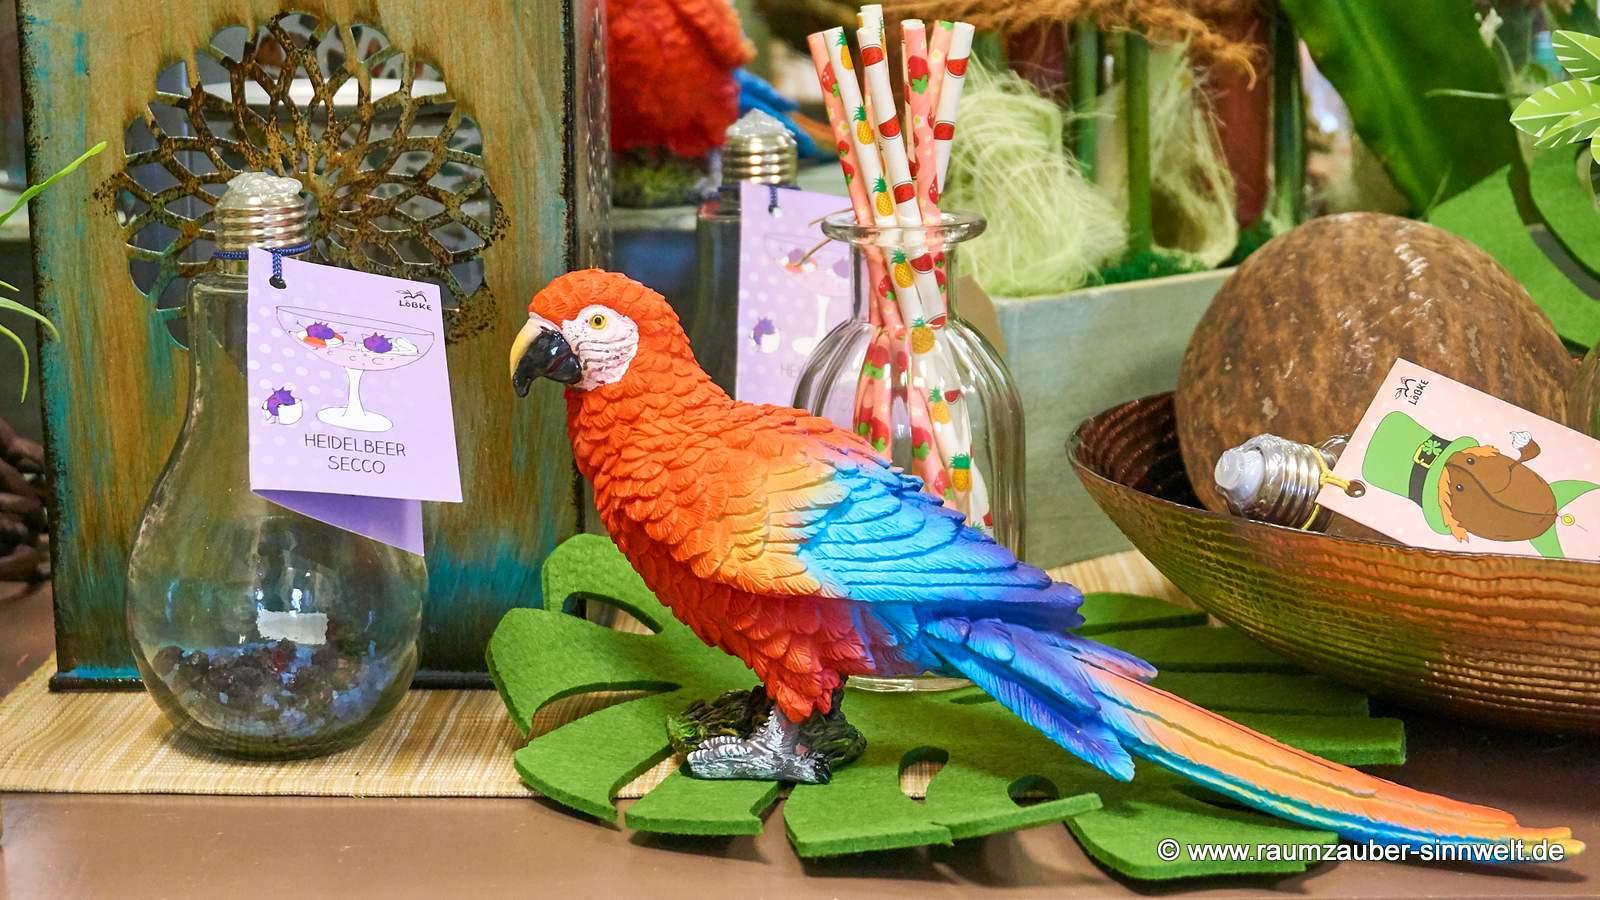 Keramik-Papagei mit Secco-Glühbirne Cocktailansatz